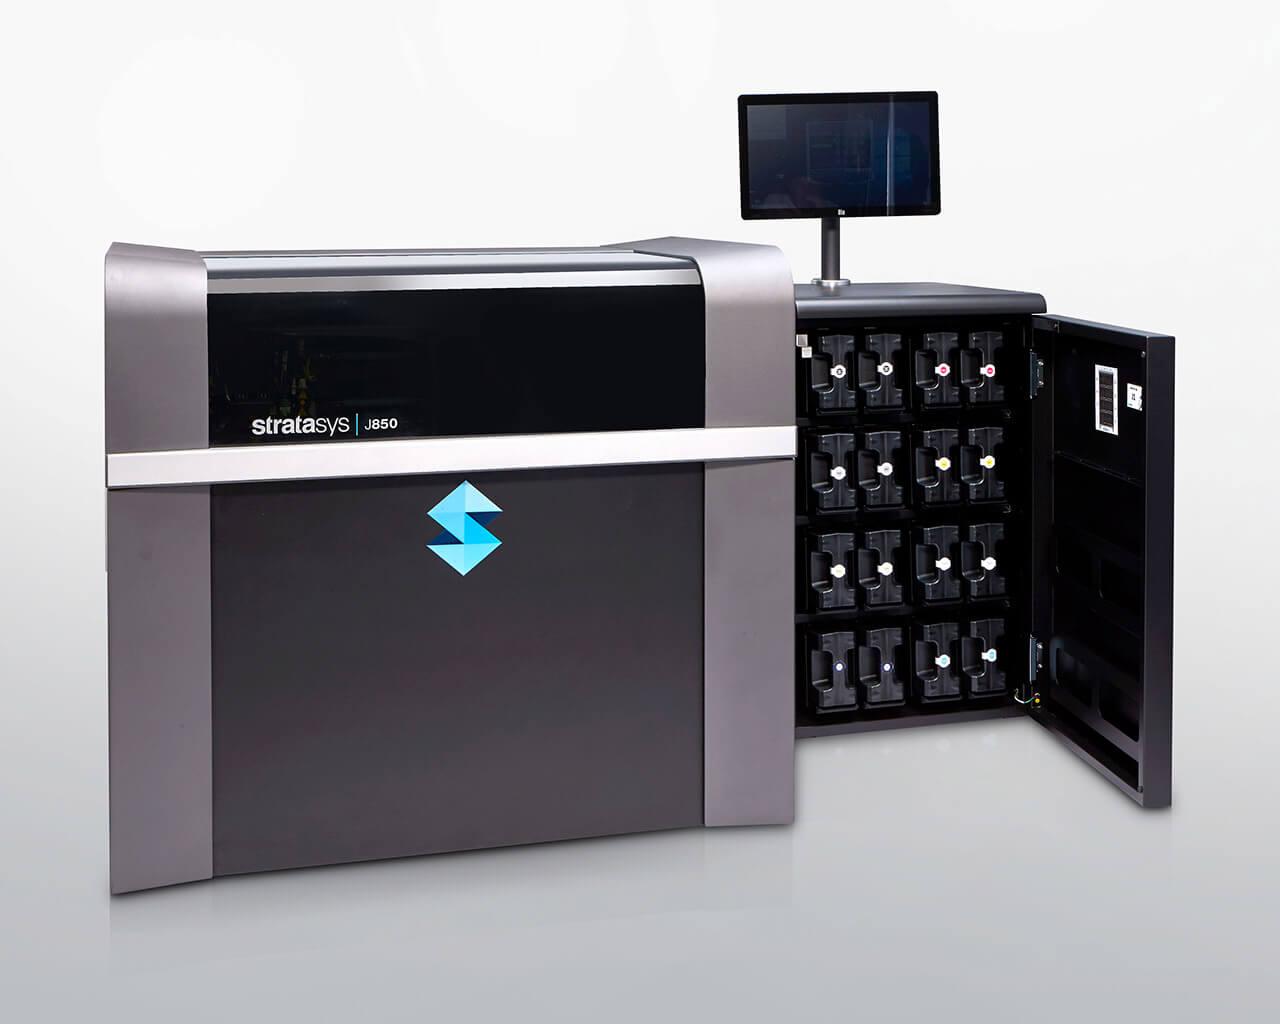 J850 Stratasys - Imprimantes 3D